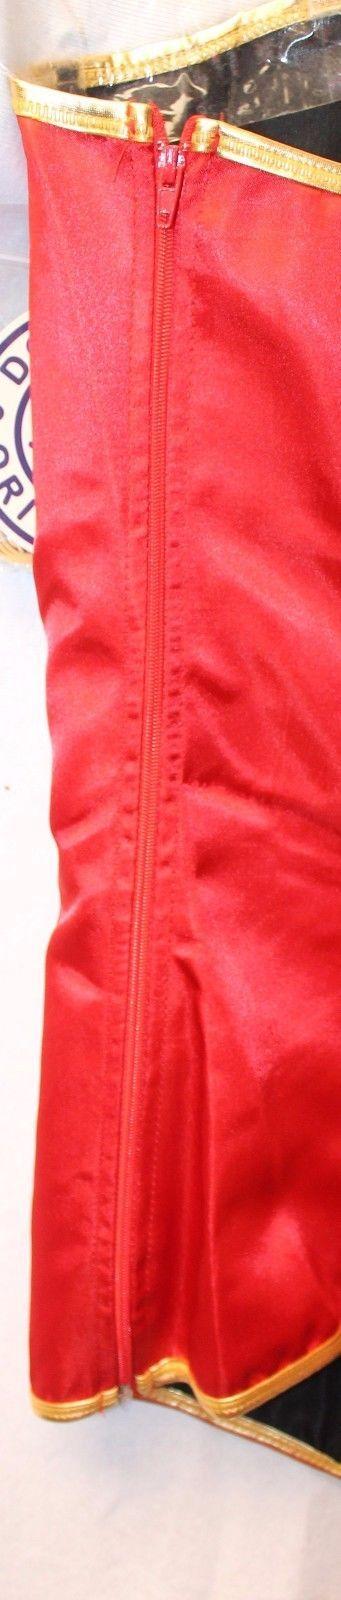 35306d880c NEW TORRID WOMENS PLUS SIZE 4X 4XL WONDER WOMAN COSPLAY SUPERHERO CORSET  BUSTIER